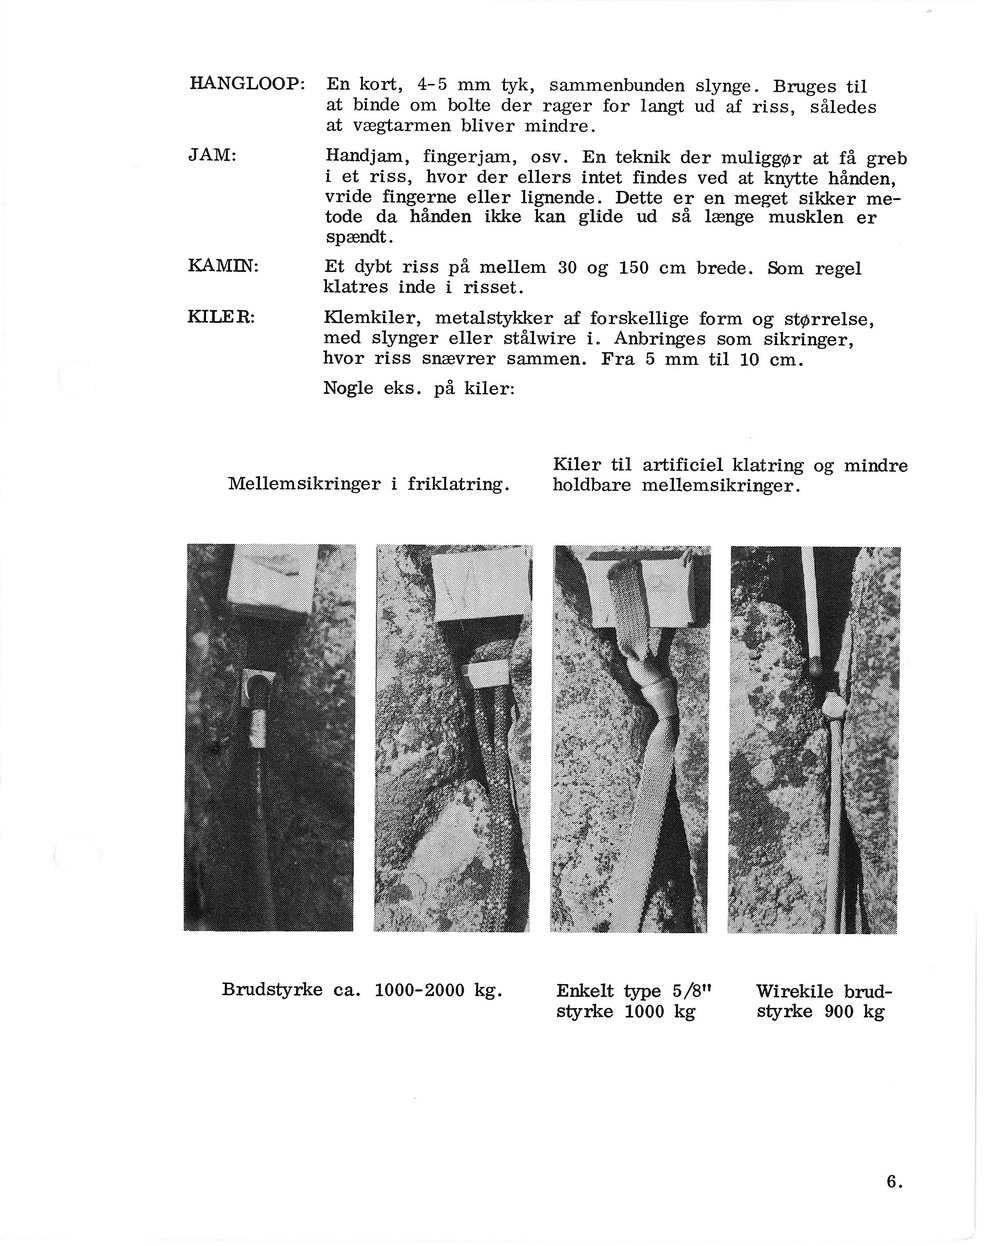 Kullen guide 1972 006.jpg